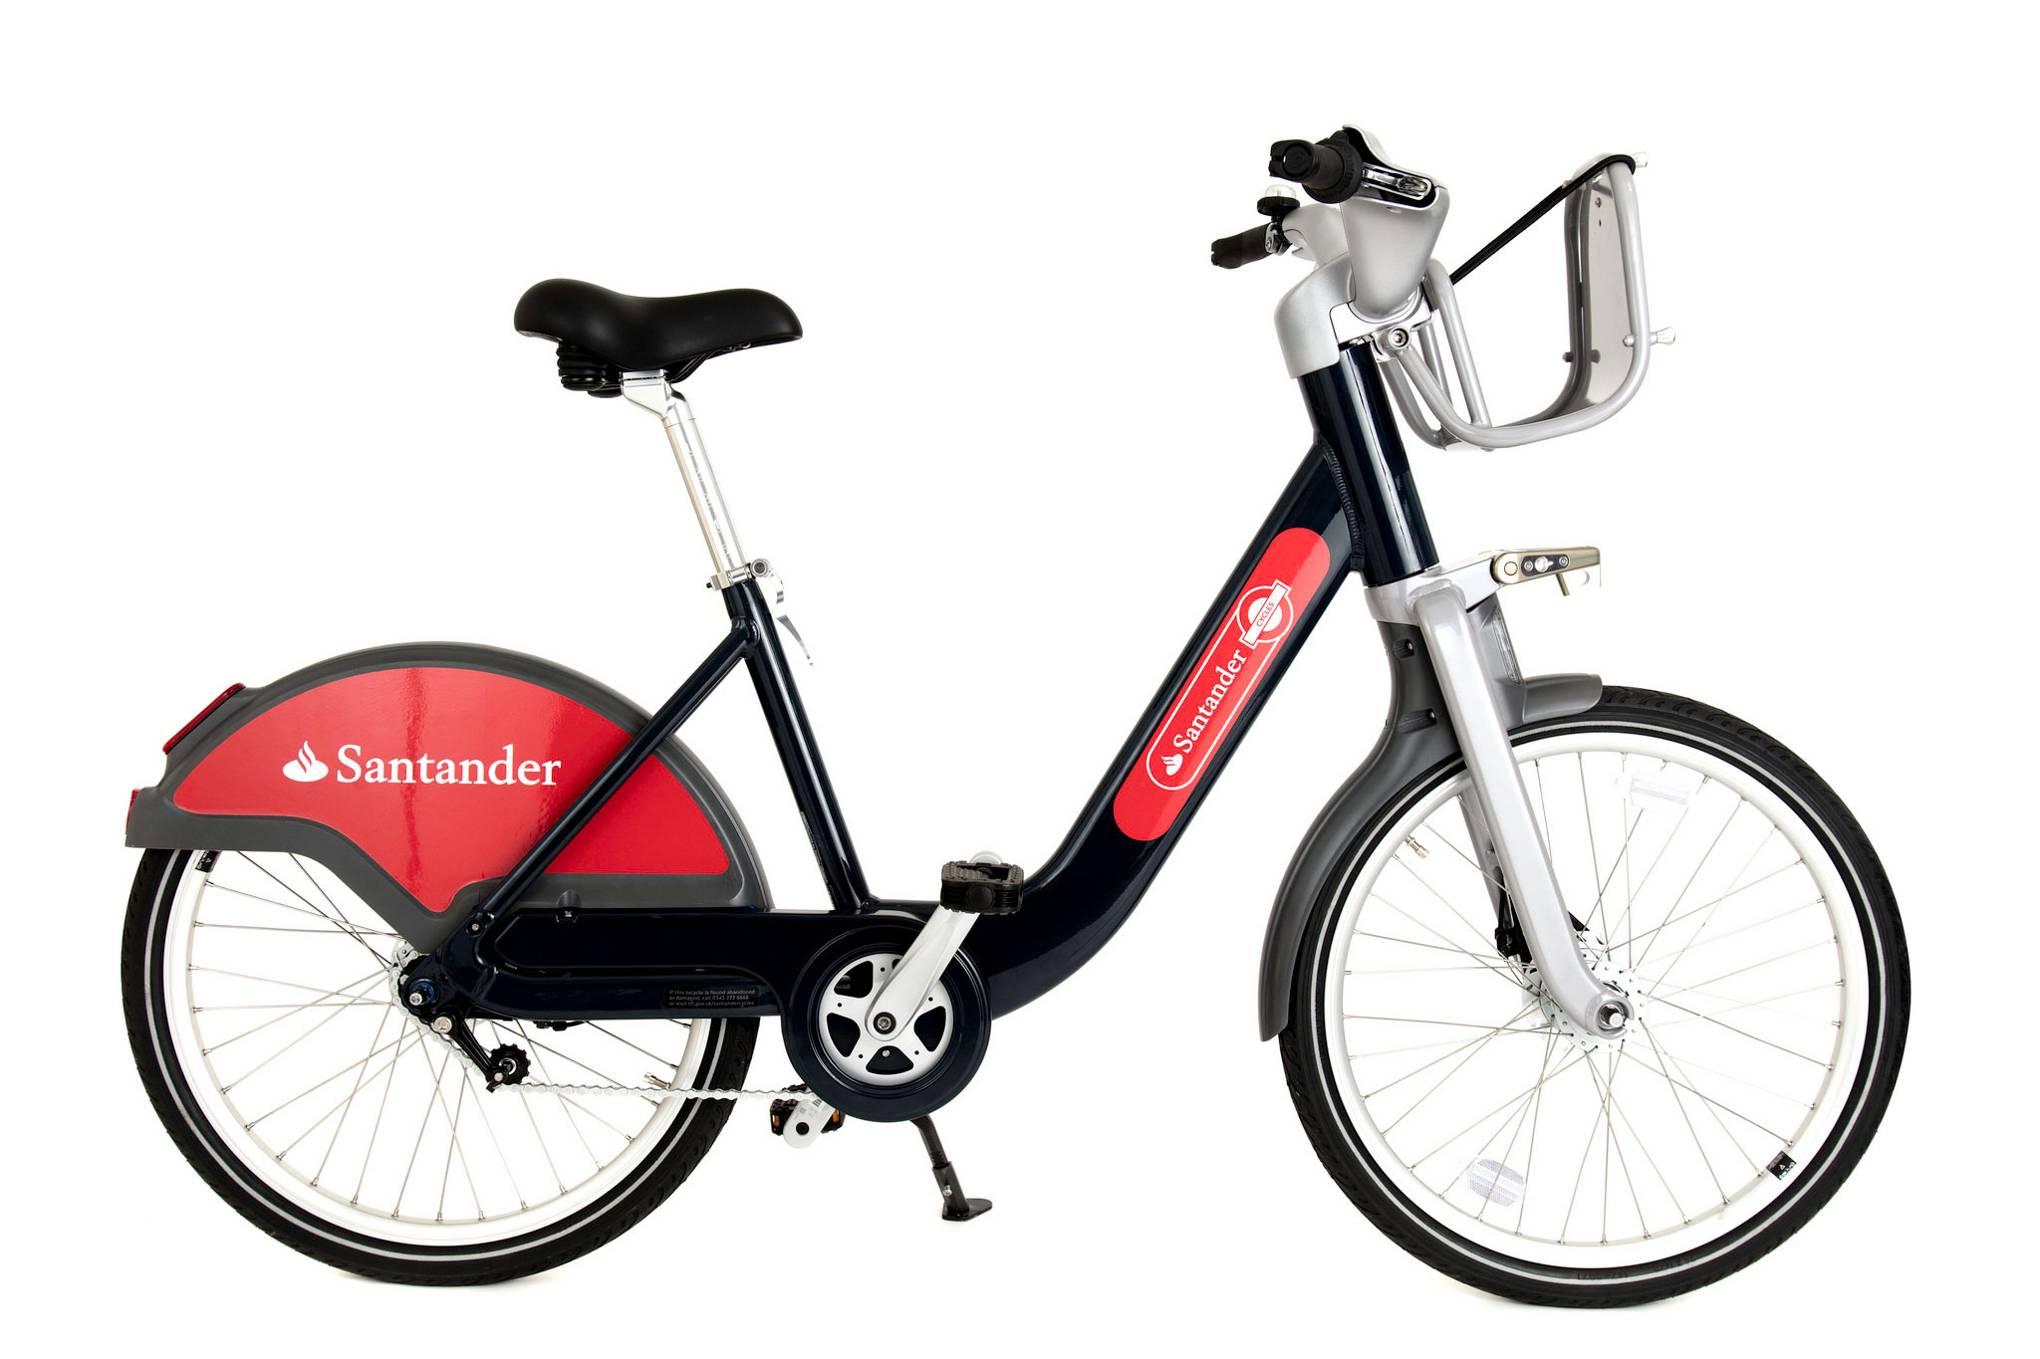 Santander hire bike scheme